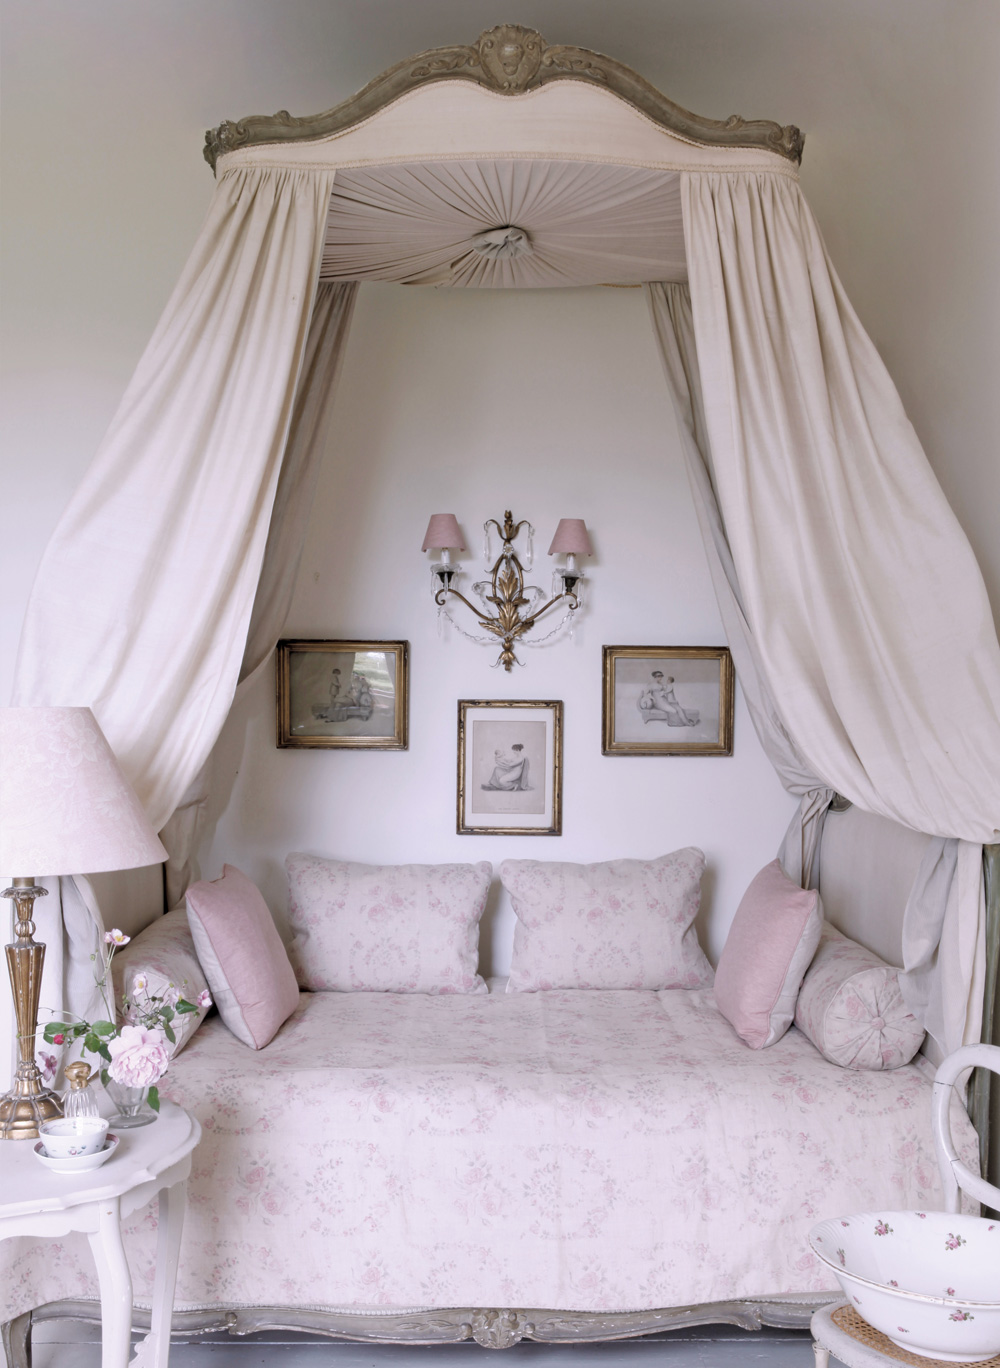 Amelia-Bed